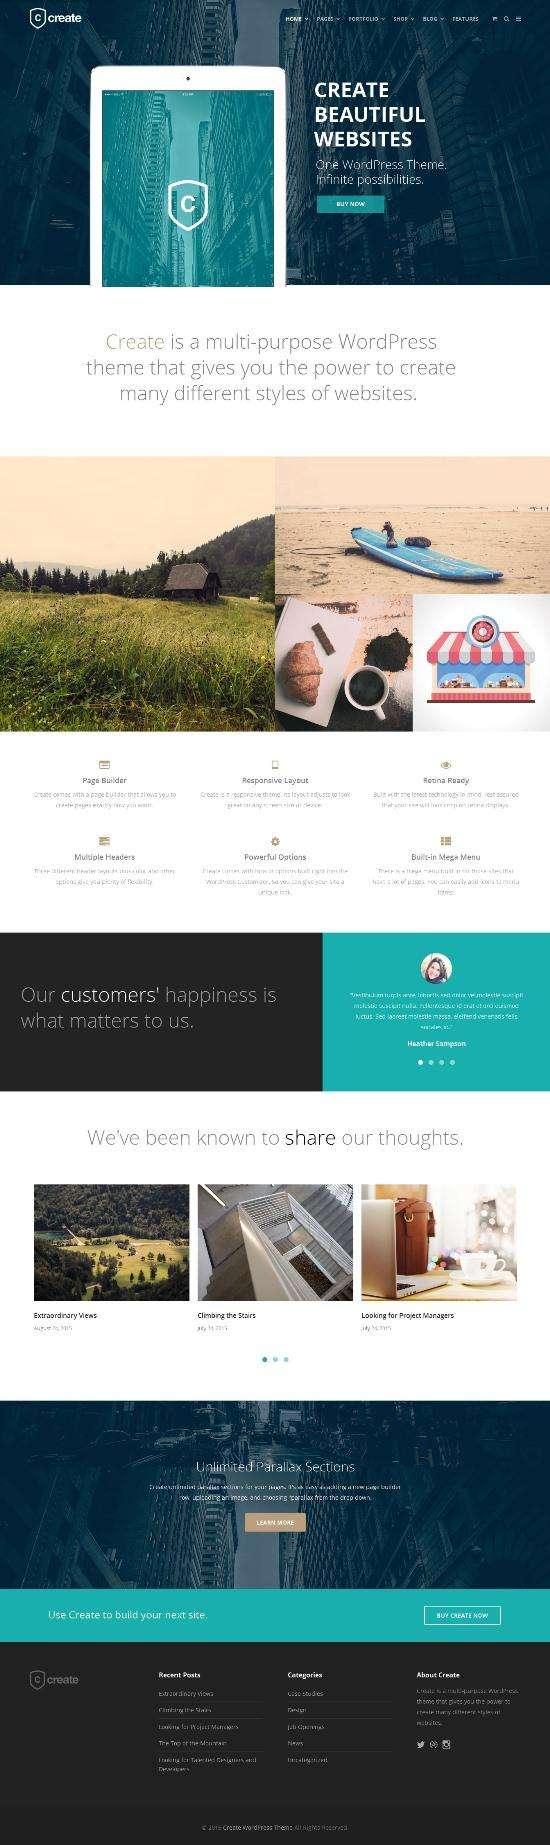 create themetrust theme 01 - ThemeTrust Create WordPress Theme